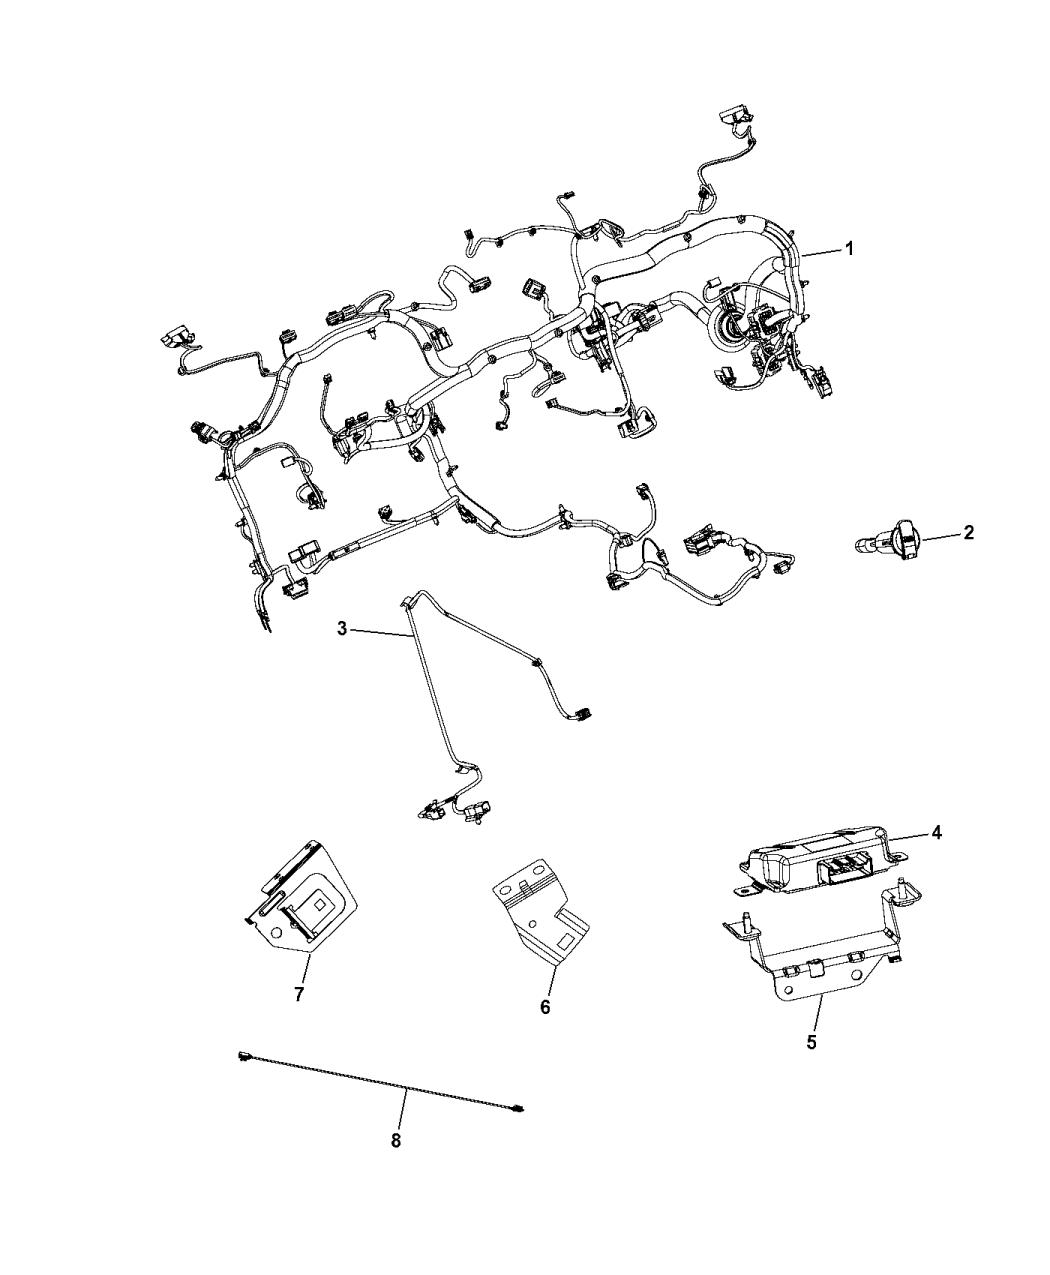 usb port data sheet, usb pinout wiring diagram, micro usb wiring diagram, usb connections diagram, ethernet port wiring diagram, usb port heater, usb port wire, usb port parts diagram, usb cord wiring diagram, usb charger wiring diagram, usb port speaker, usb hub wiring diagram, usb 3.0 wiring-diagram, usb cable pinout, usb port circuit diagram, usb to serial wiring-diagram, serial port wiring diagram, usb to db9 wiring-diagram, usb mouse wiring diagram, usb to rj45 wiring-diagram, on usb port wiring diagram installation